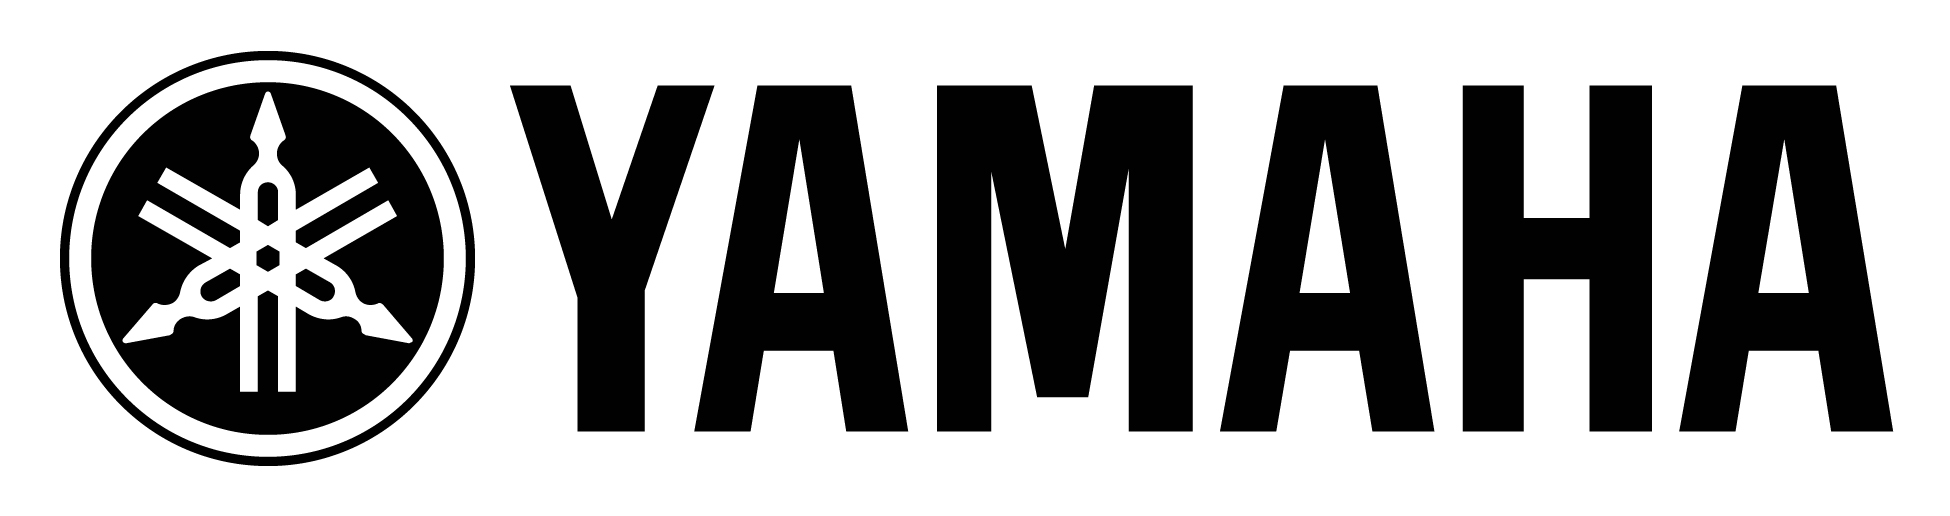 Dave Gerhart Yamaha Logo